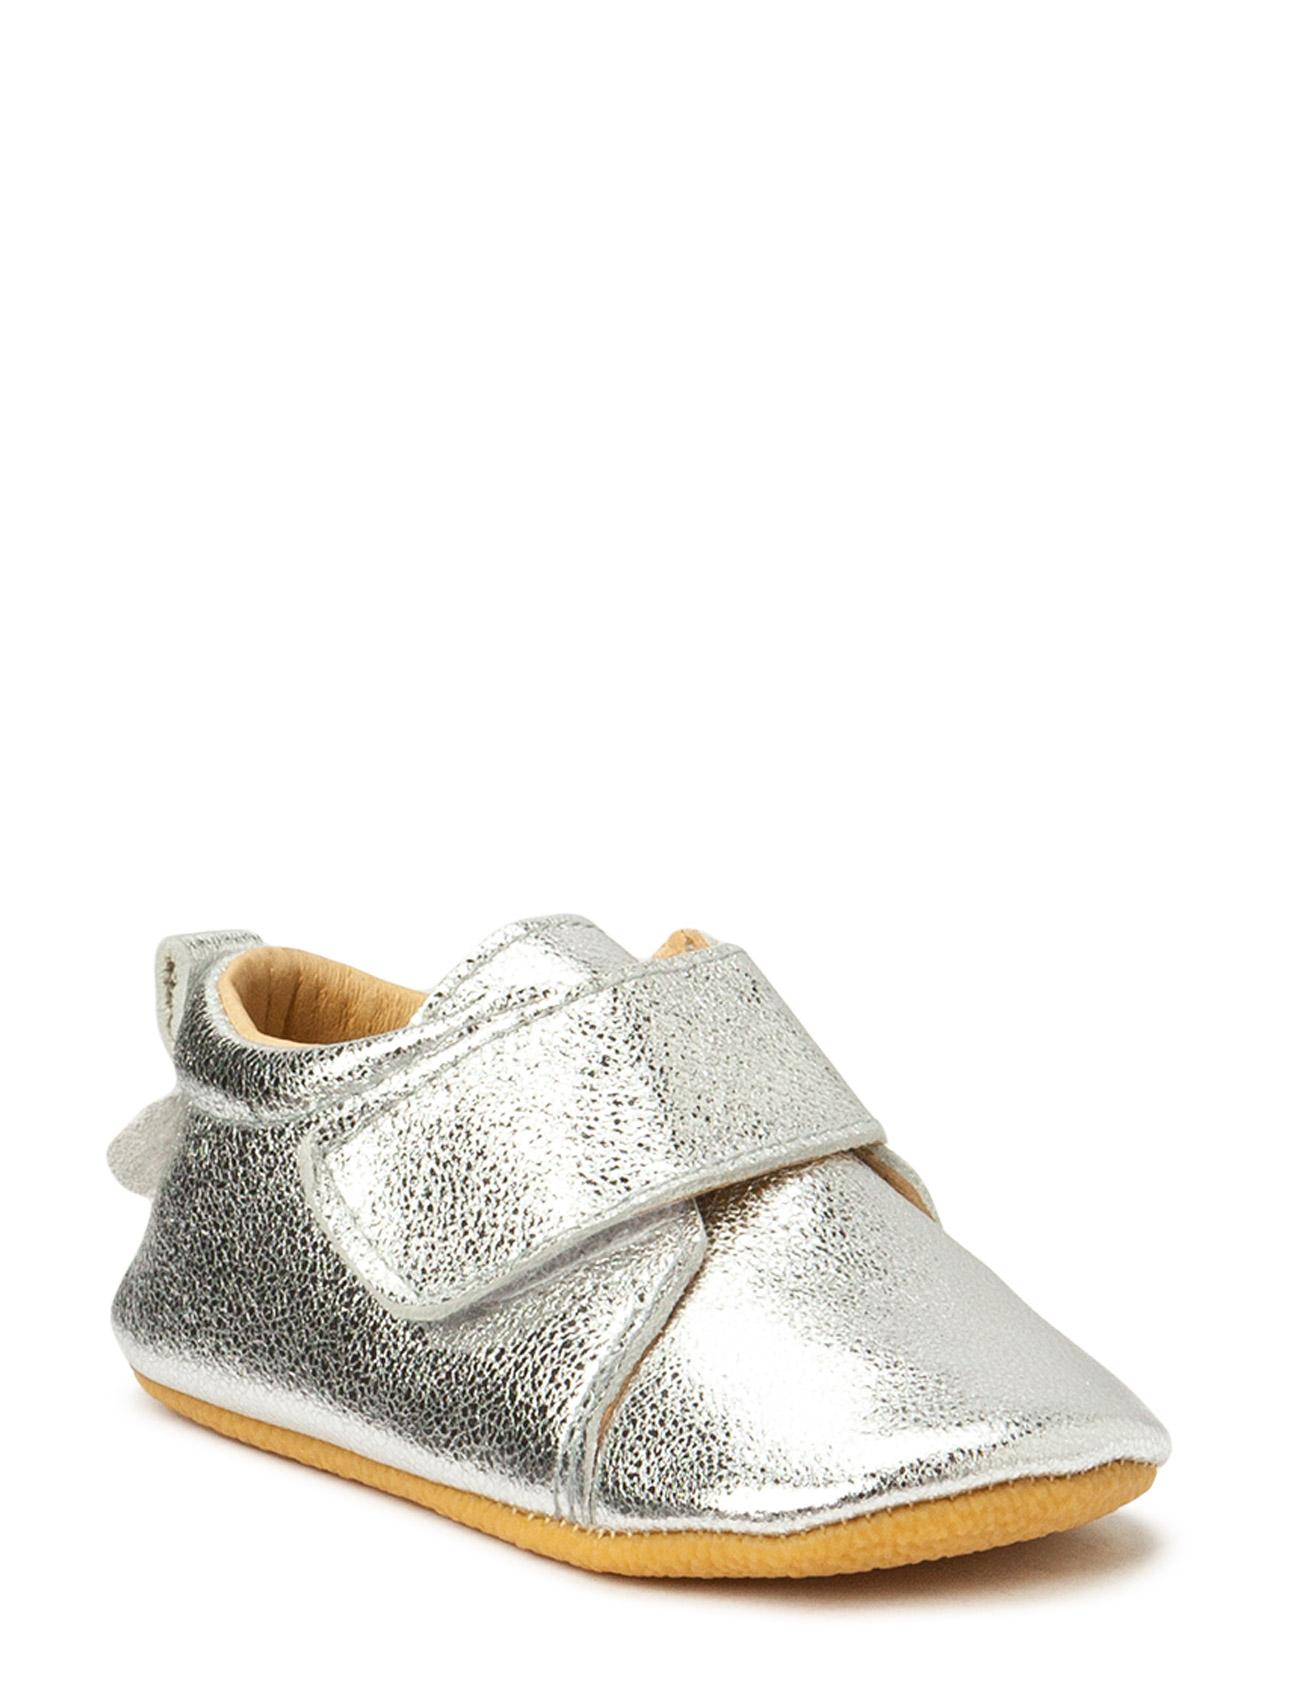 209cb153ebf Prewalker Velcro Shoe Move by Melton Sko & Sneakers til Børn i ...